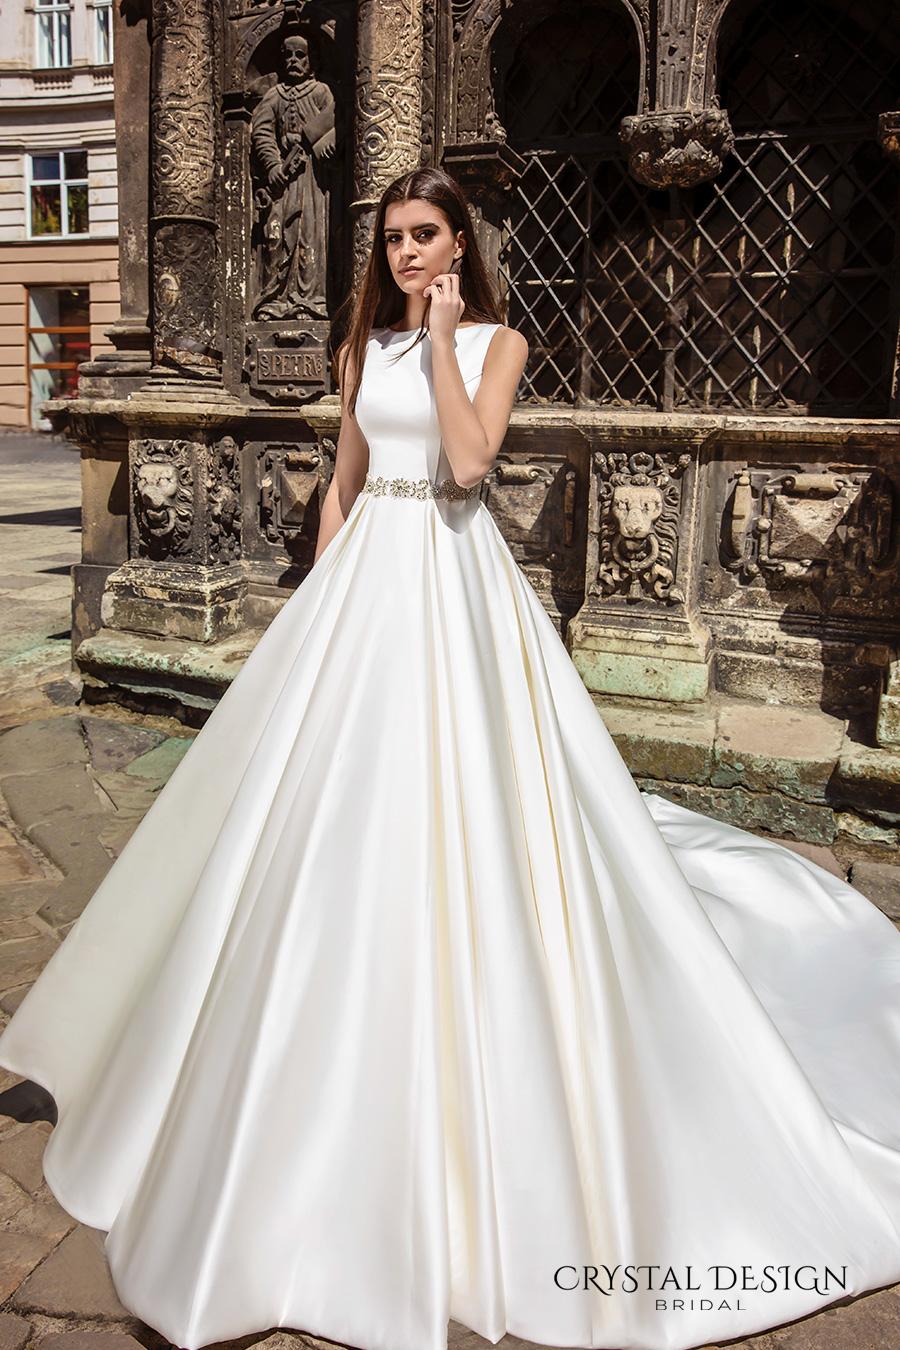 Simple elegant wedding gown designs wedding dresses in jax for Simple wedding dress design